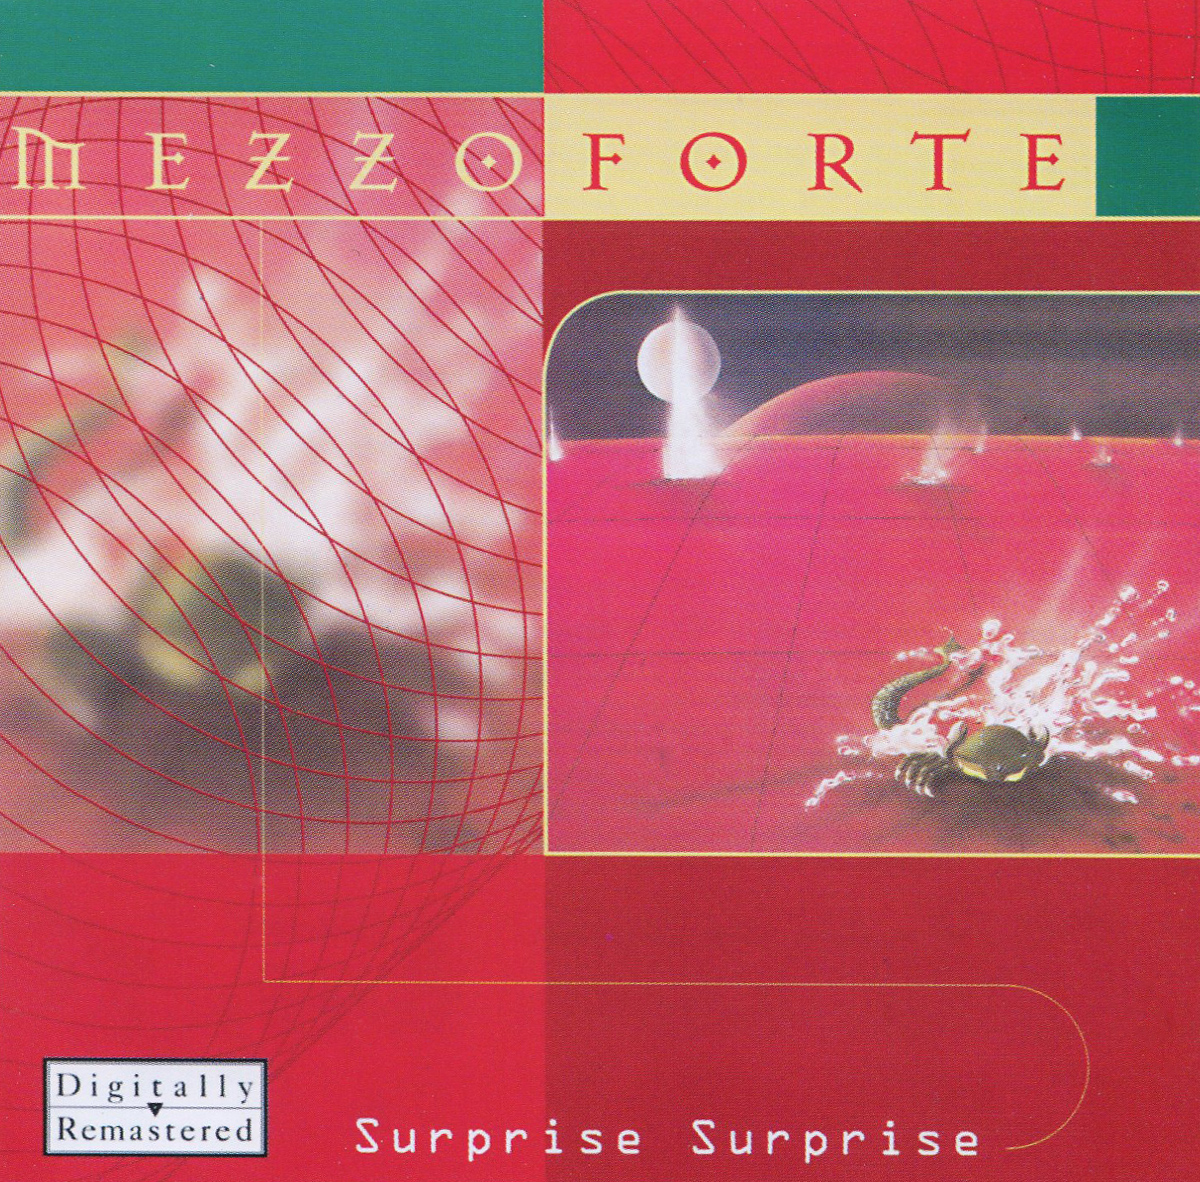 Mezzoforte Mezzoforte. Surprise Surprise